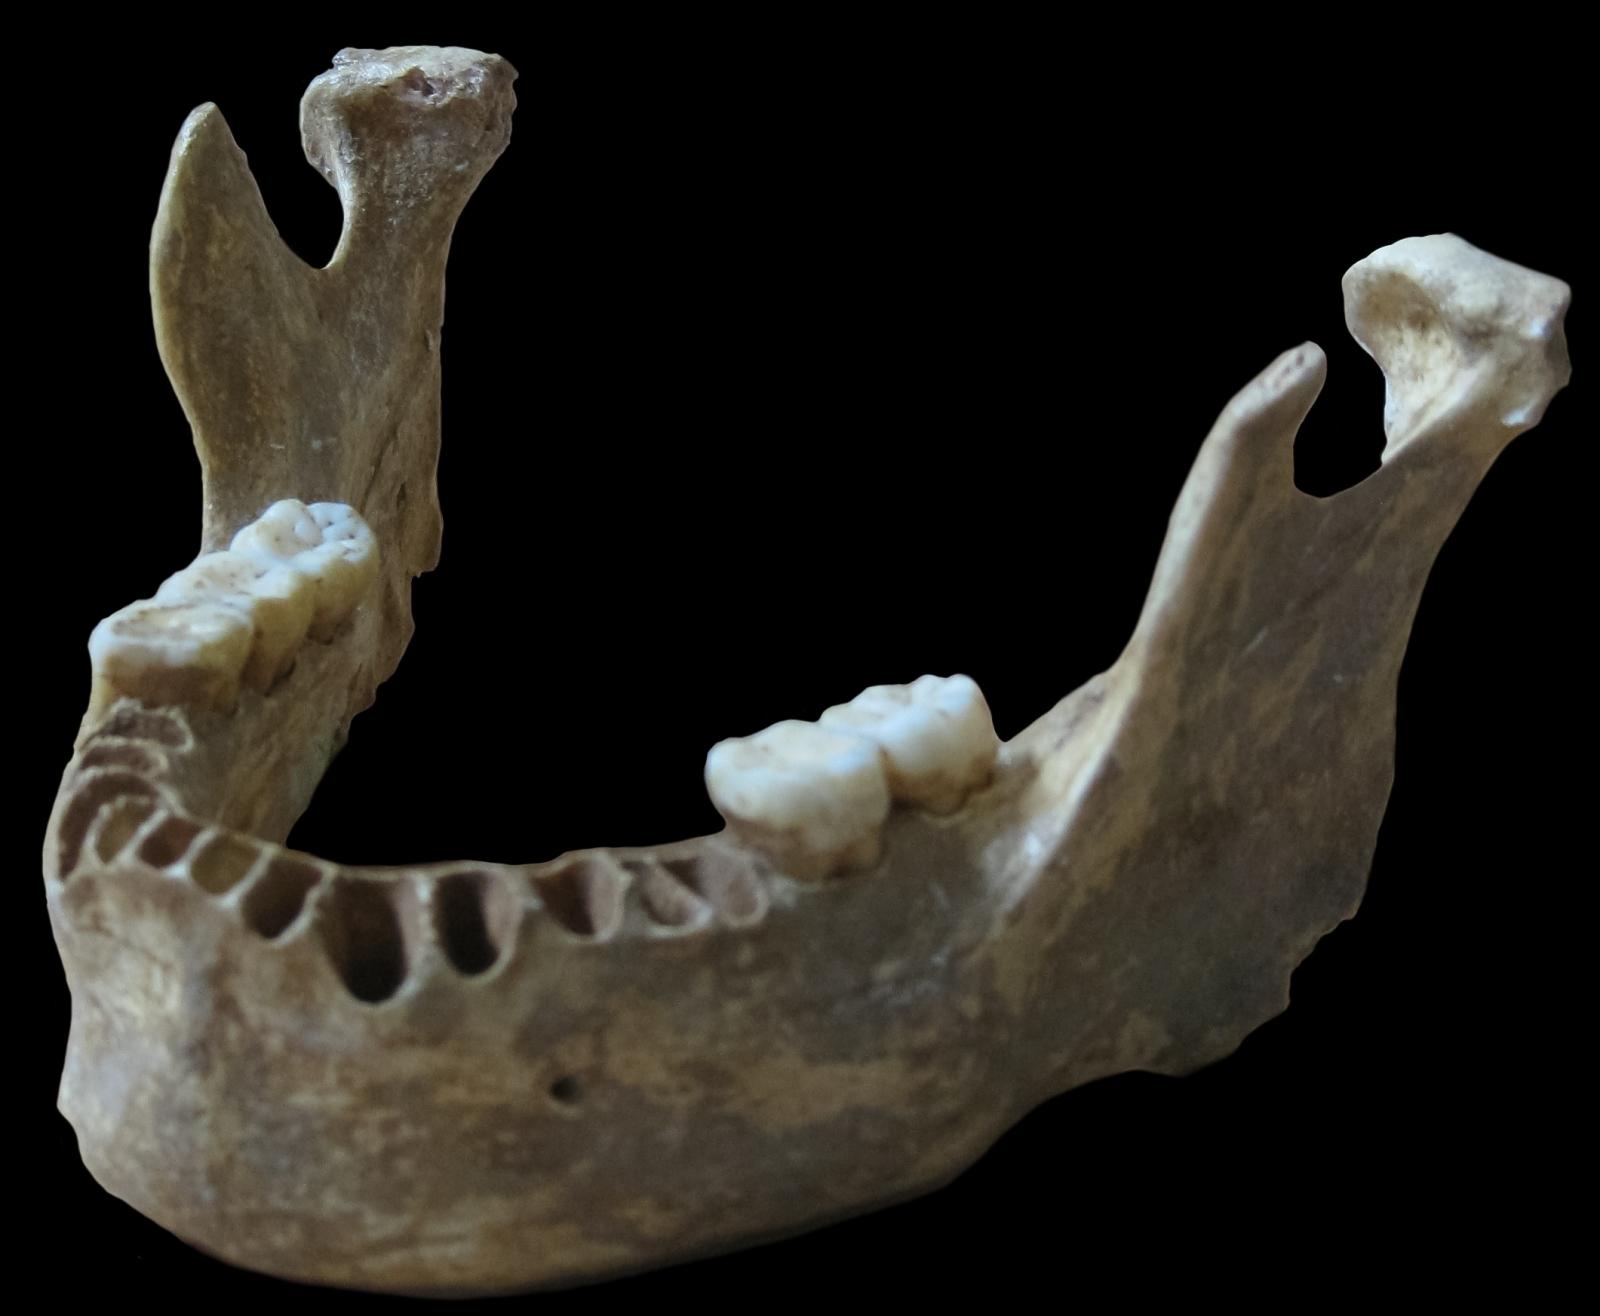 Neanderthal jaw bone